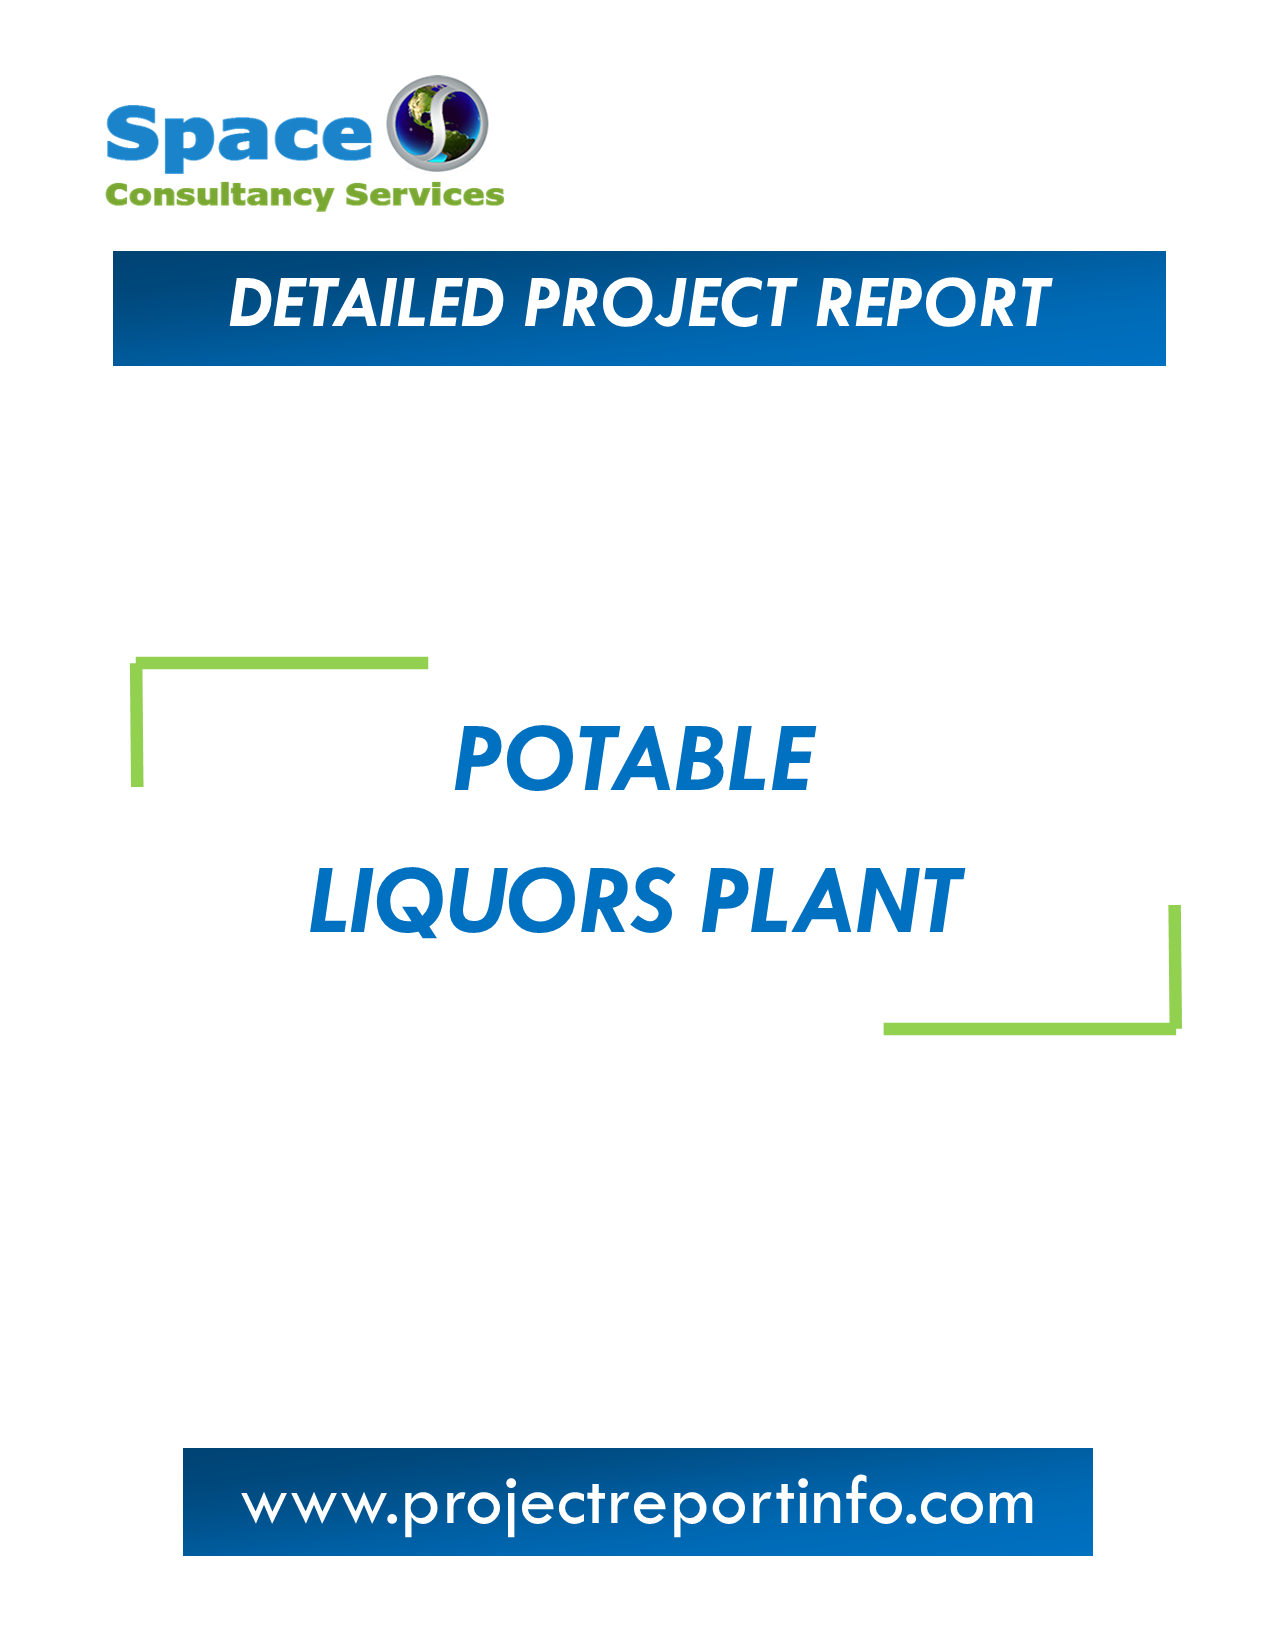 Project Report on Potable Liquors Plant